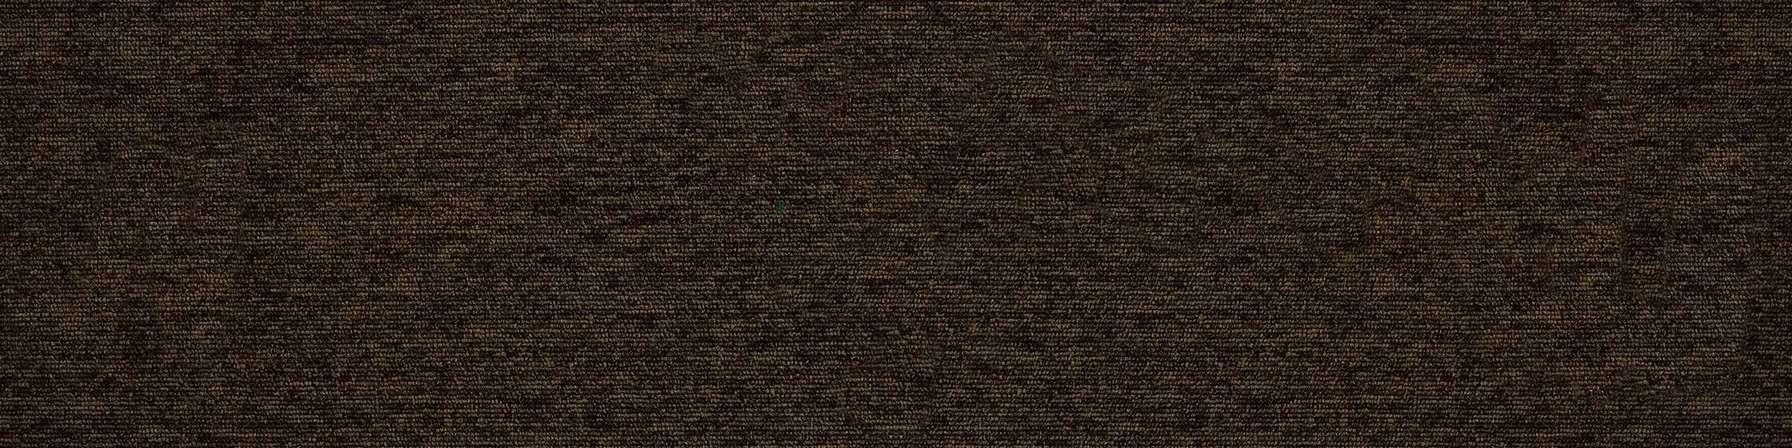 tivoli 21113 serranilla stone carpet plank